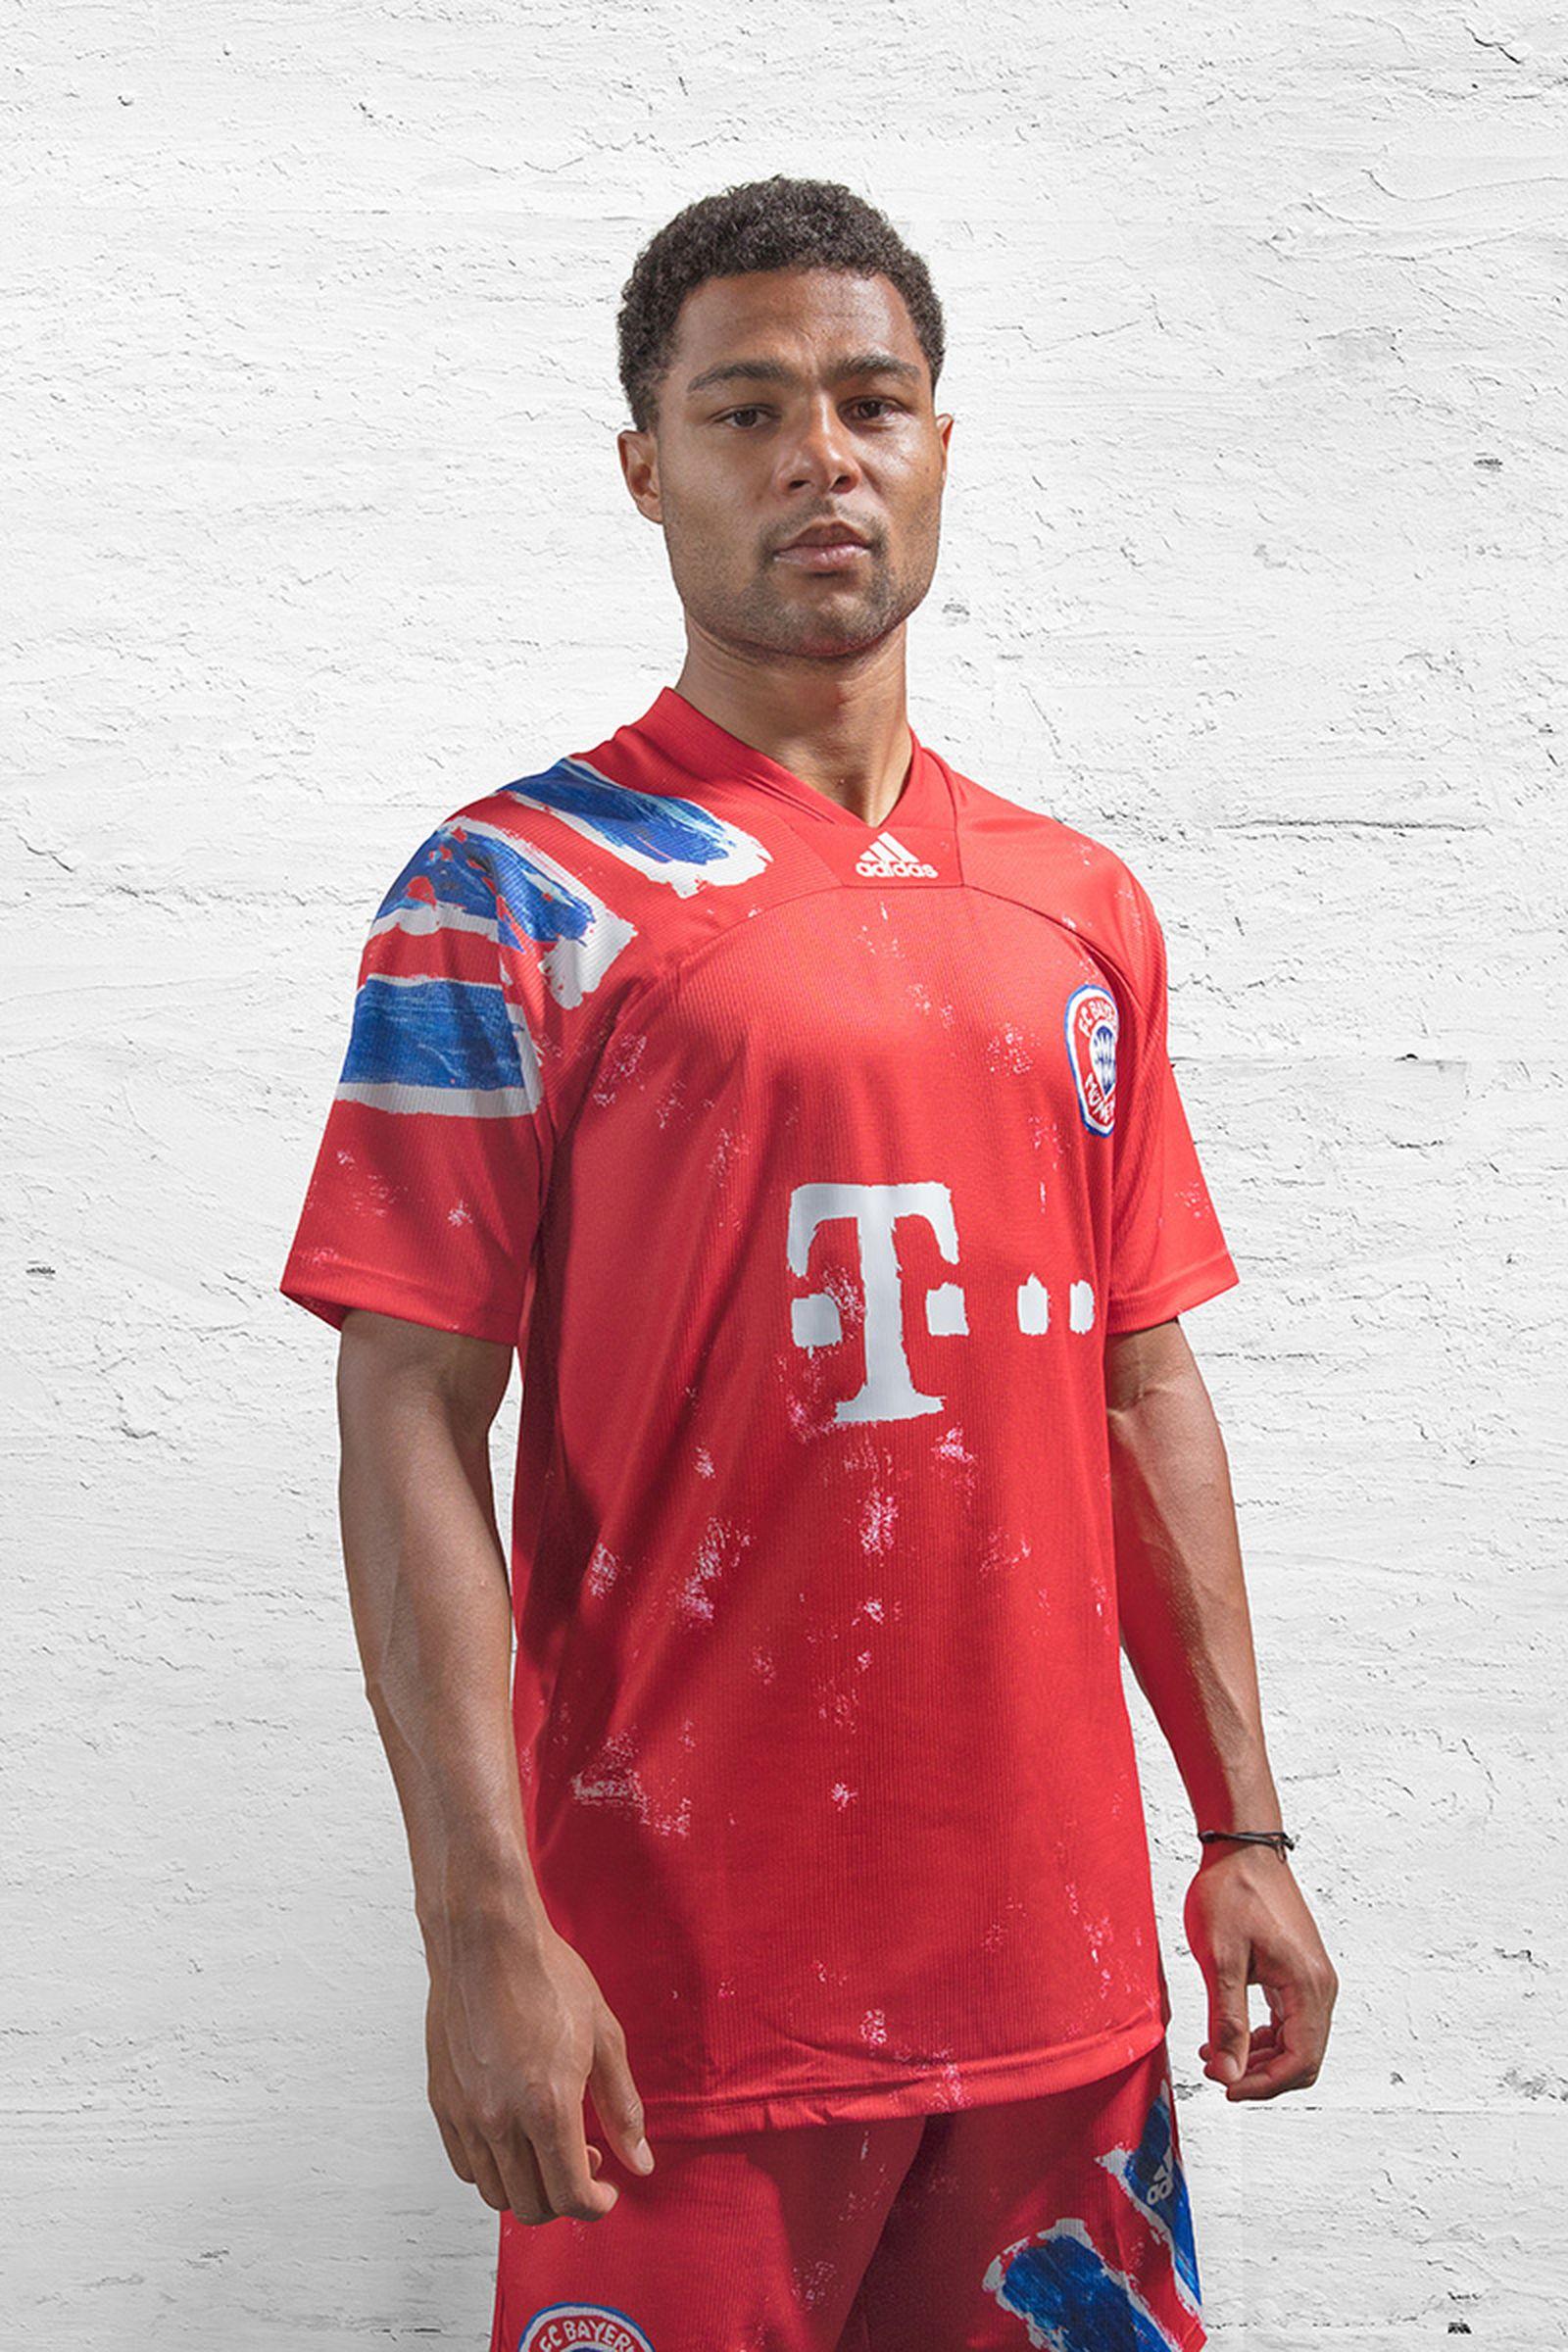 pharrell-williams-adidas-human-race-jerseys-buy-now-012